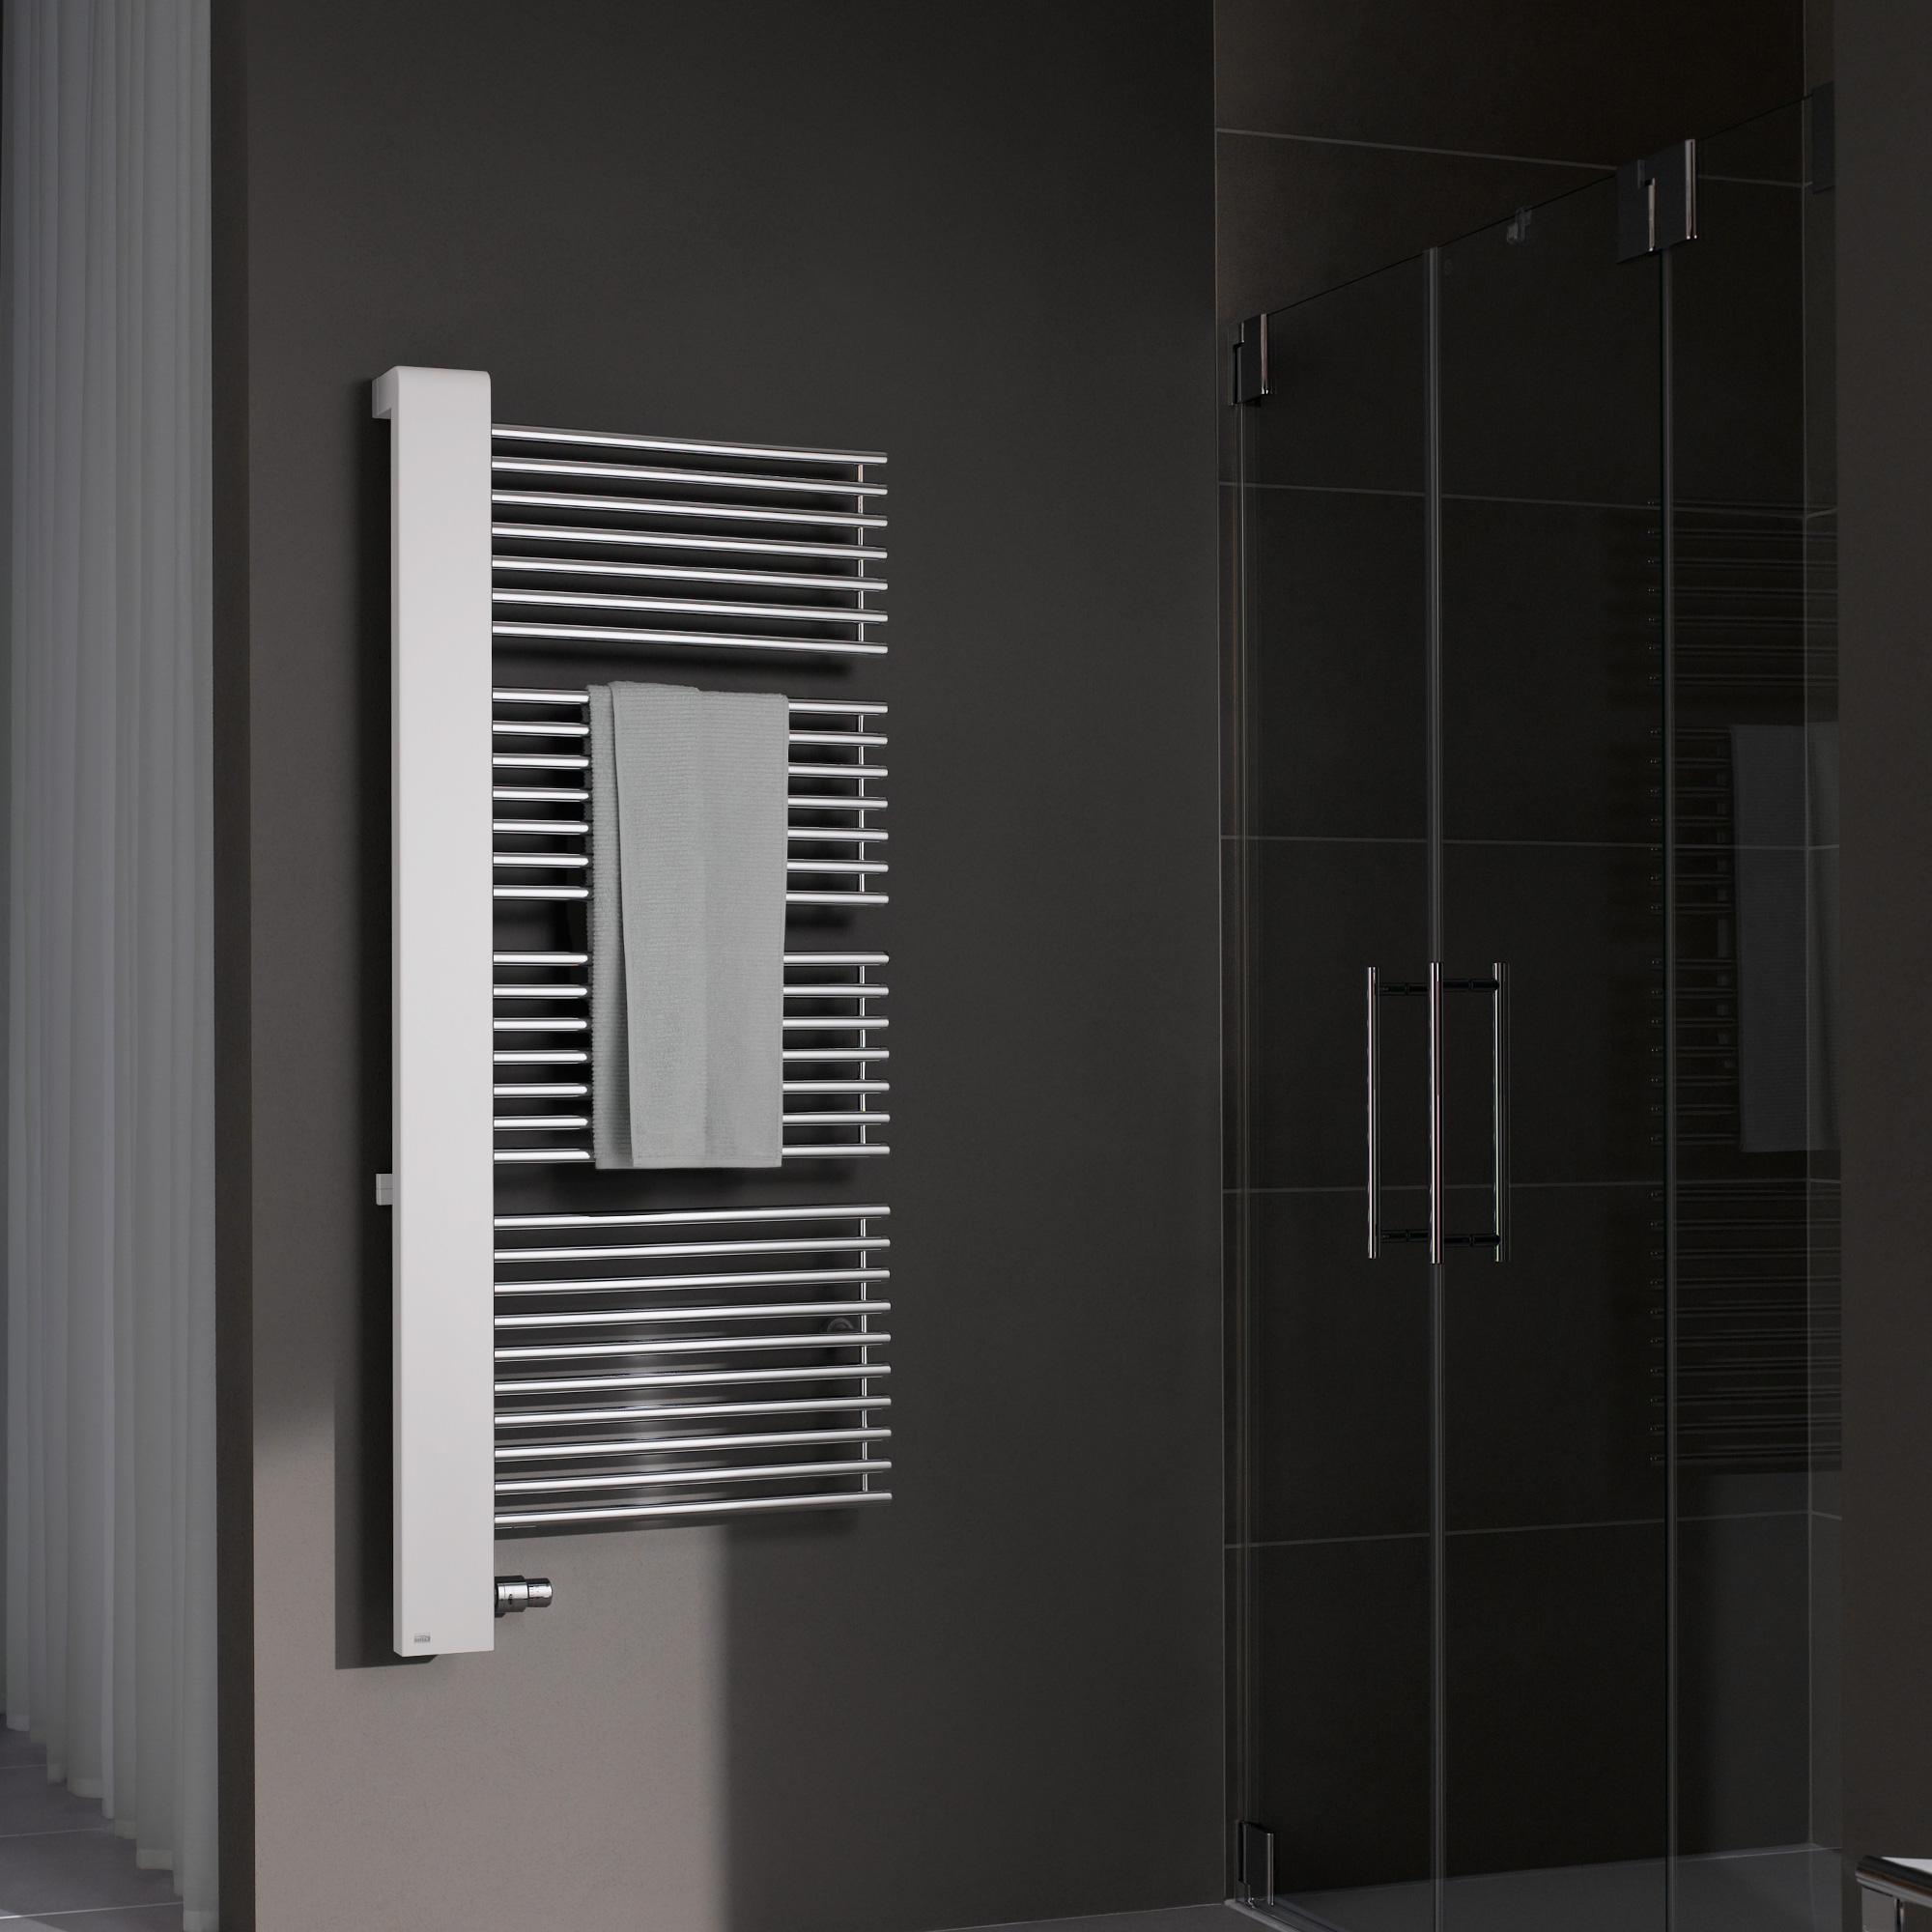 kermi credo half badheizk rper b 61 h 188 4 cm. Black Bedroom Furniture Sets. Home Design Ideas